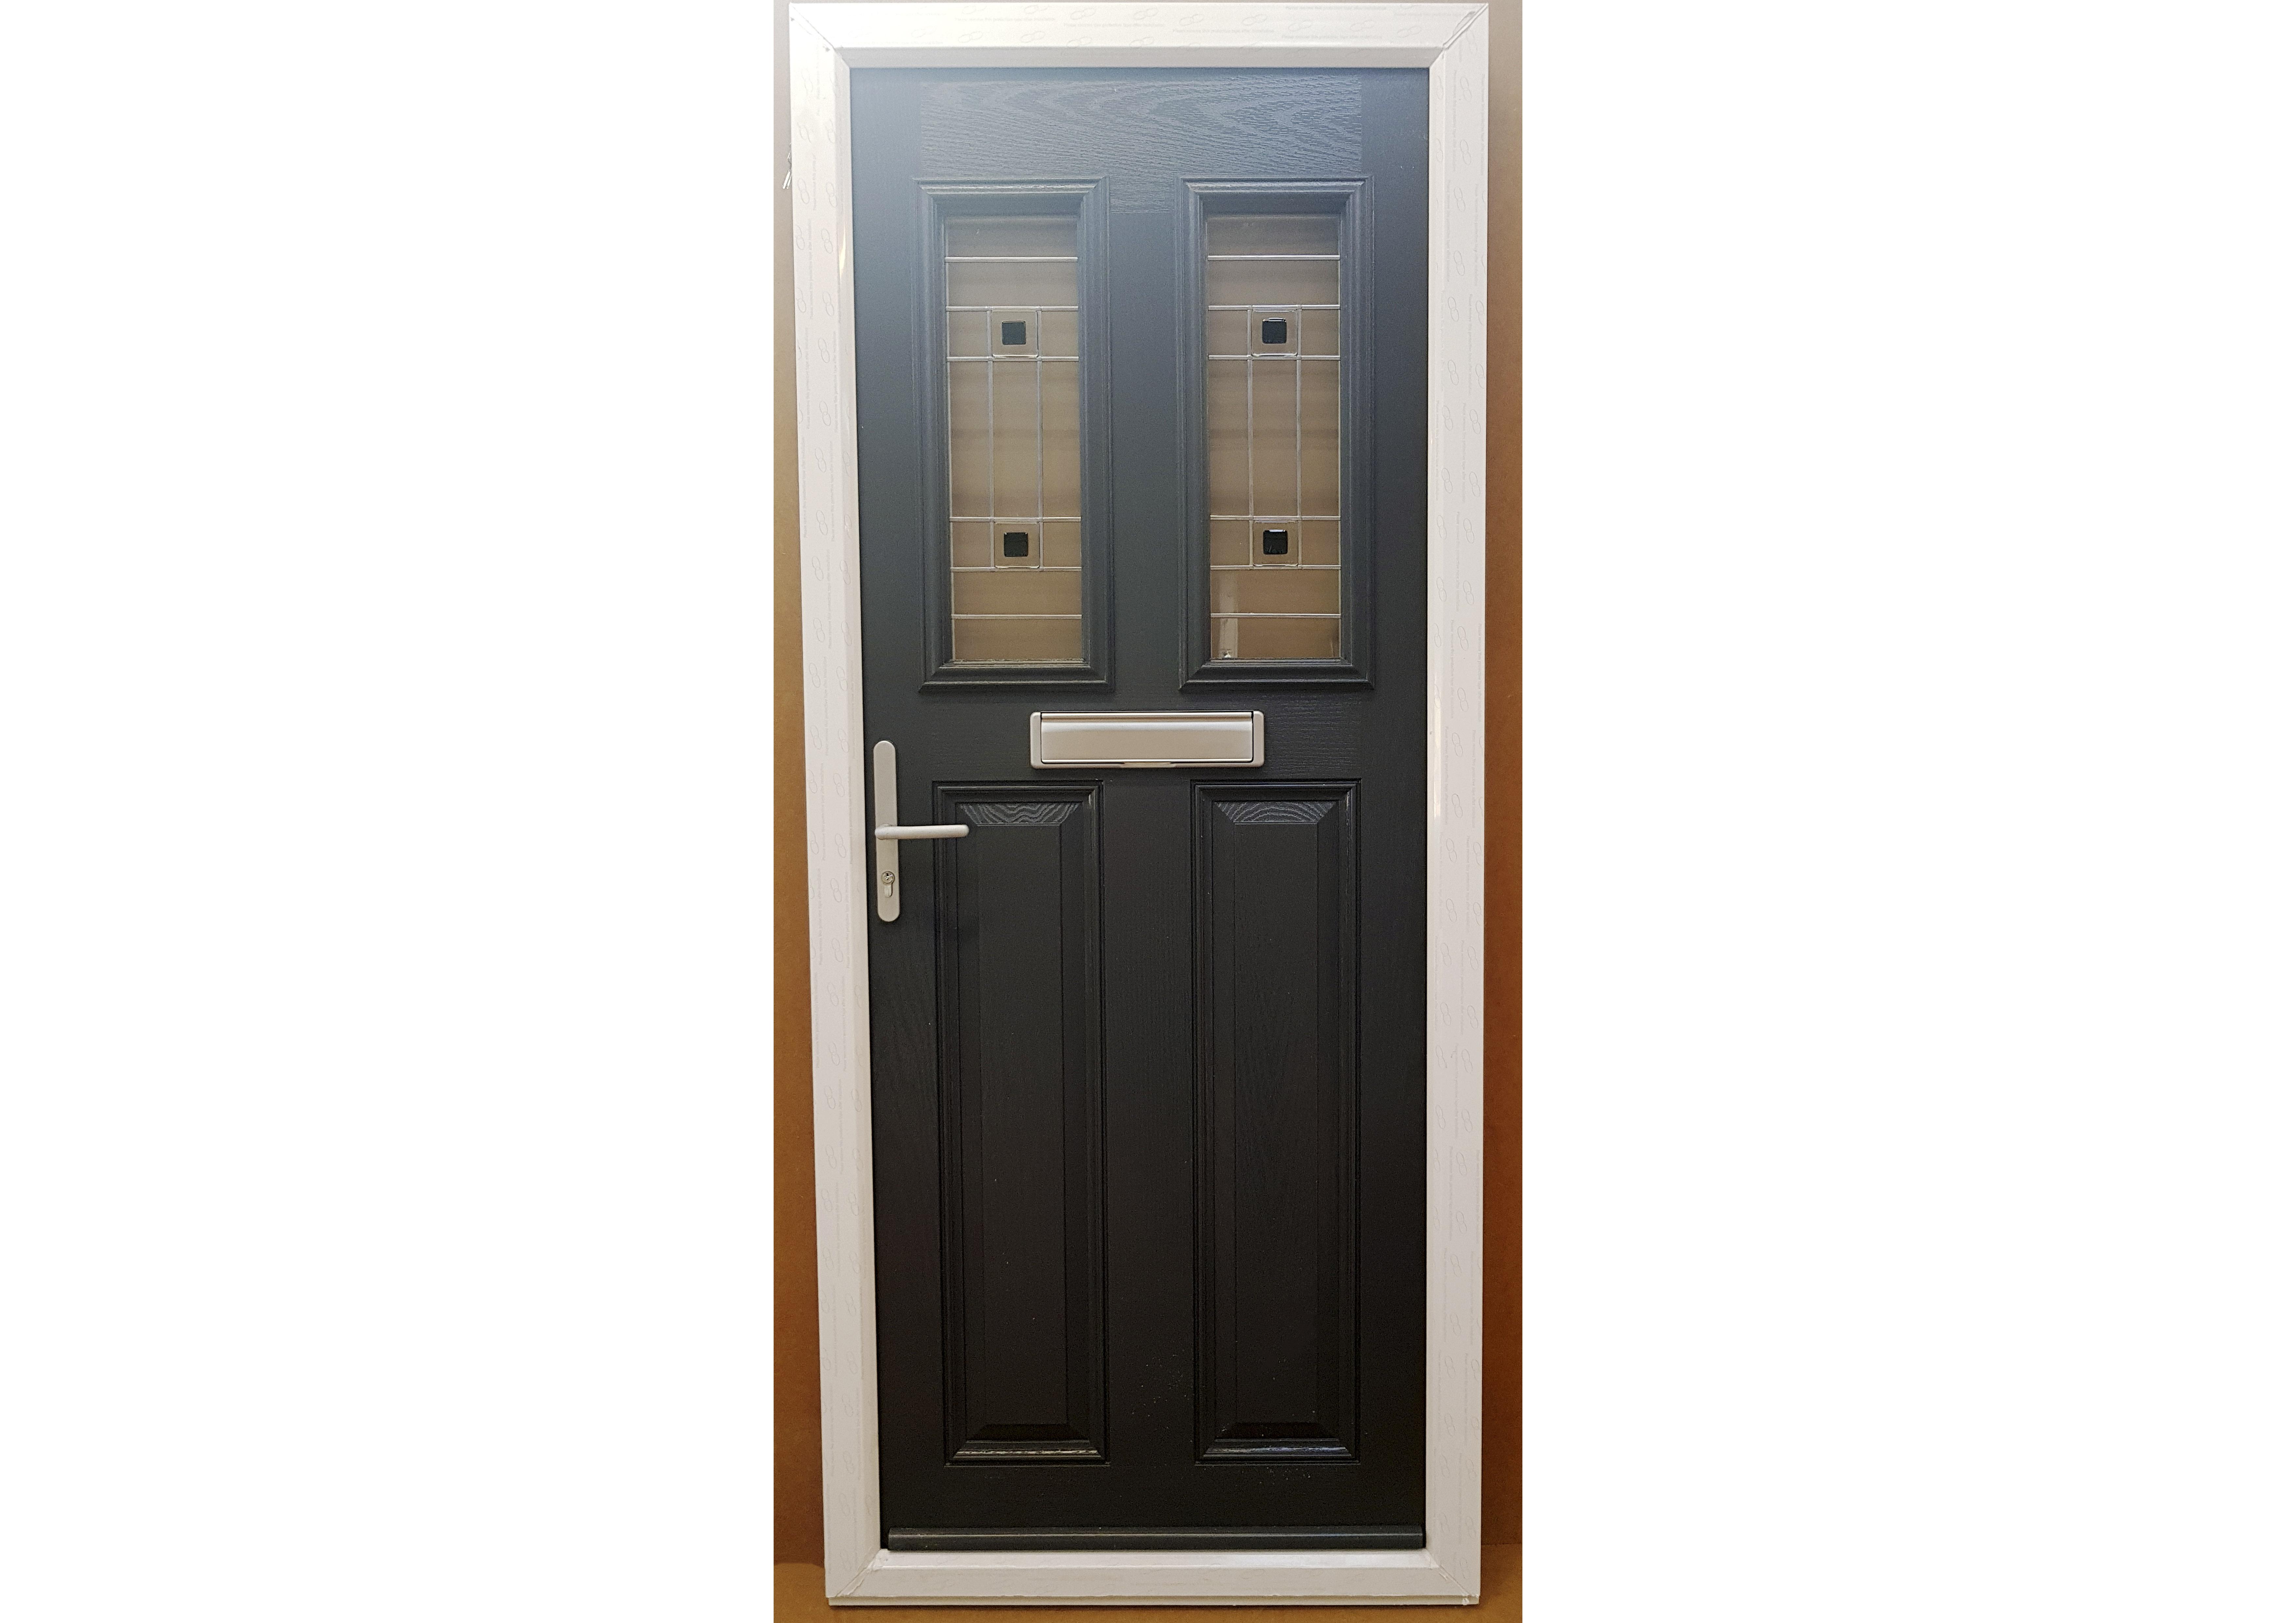 Anthracite Grey Oxford Doors